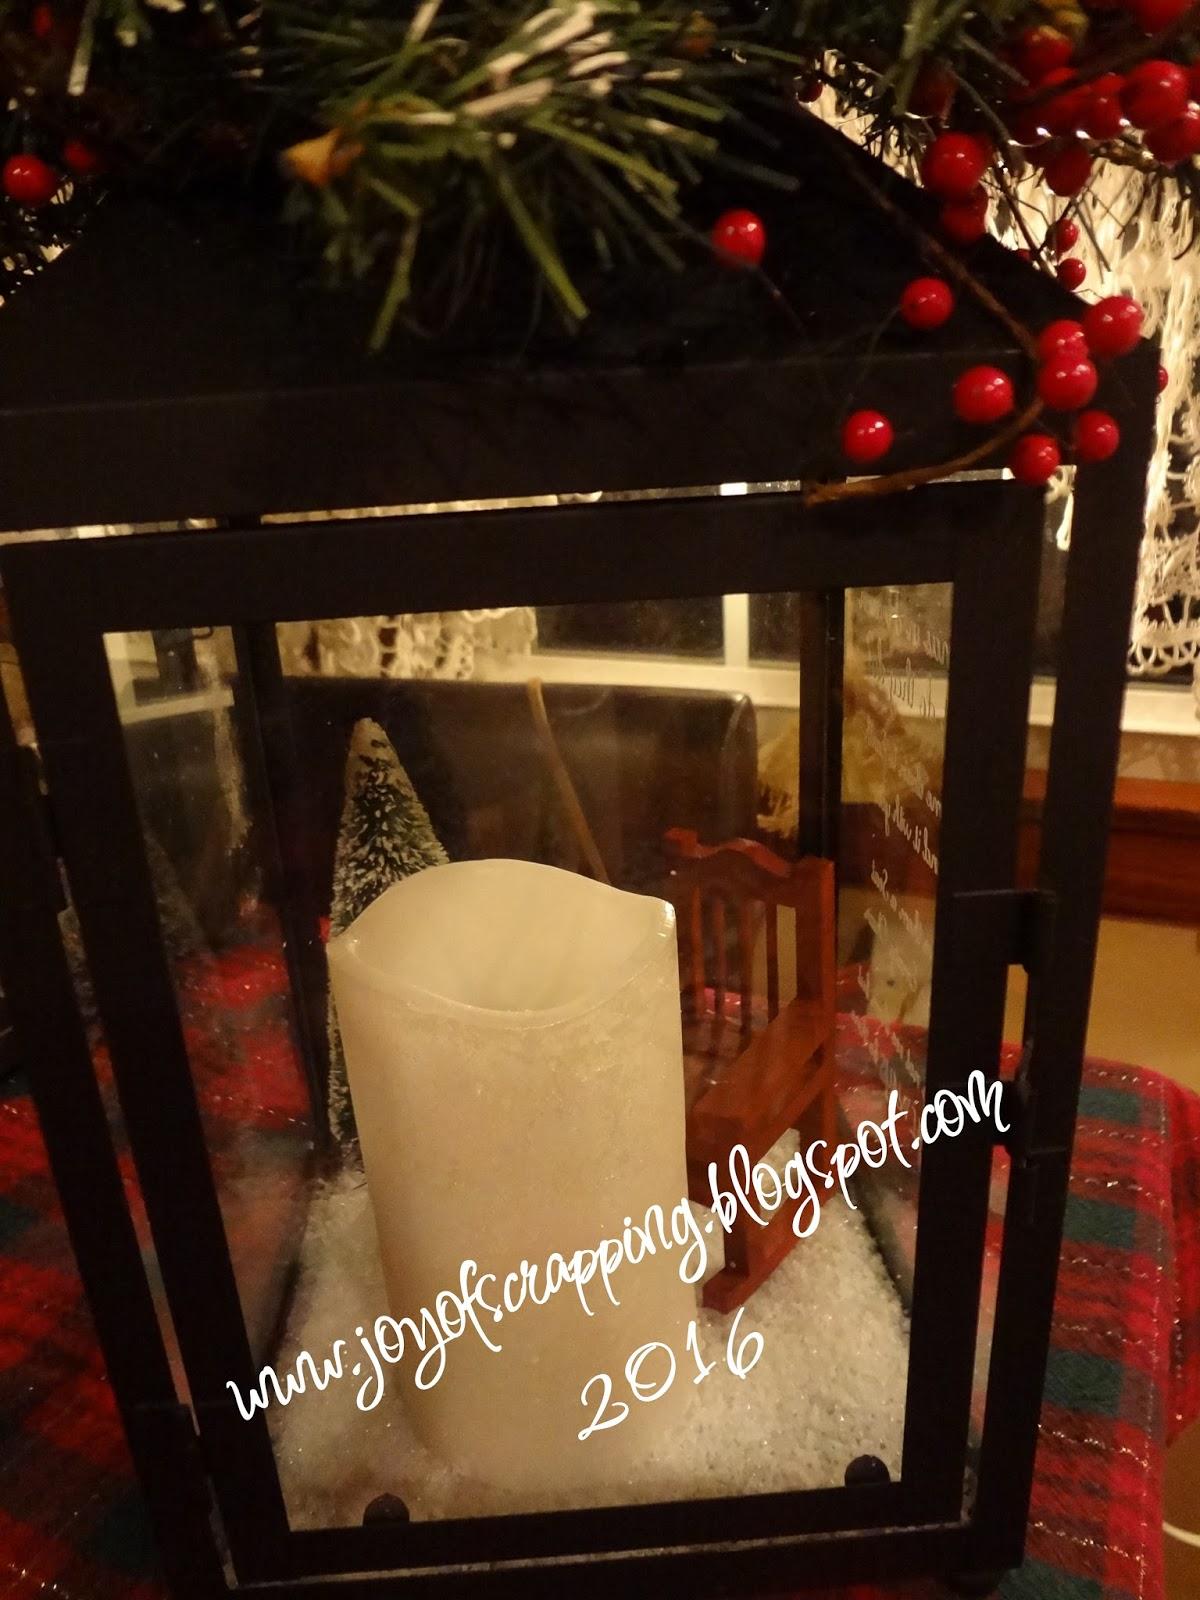 Christmas In Heaven Lantern.The Joy Of Scrapping Christmas In Heaven Lantern With Candle